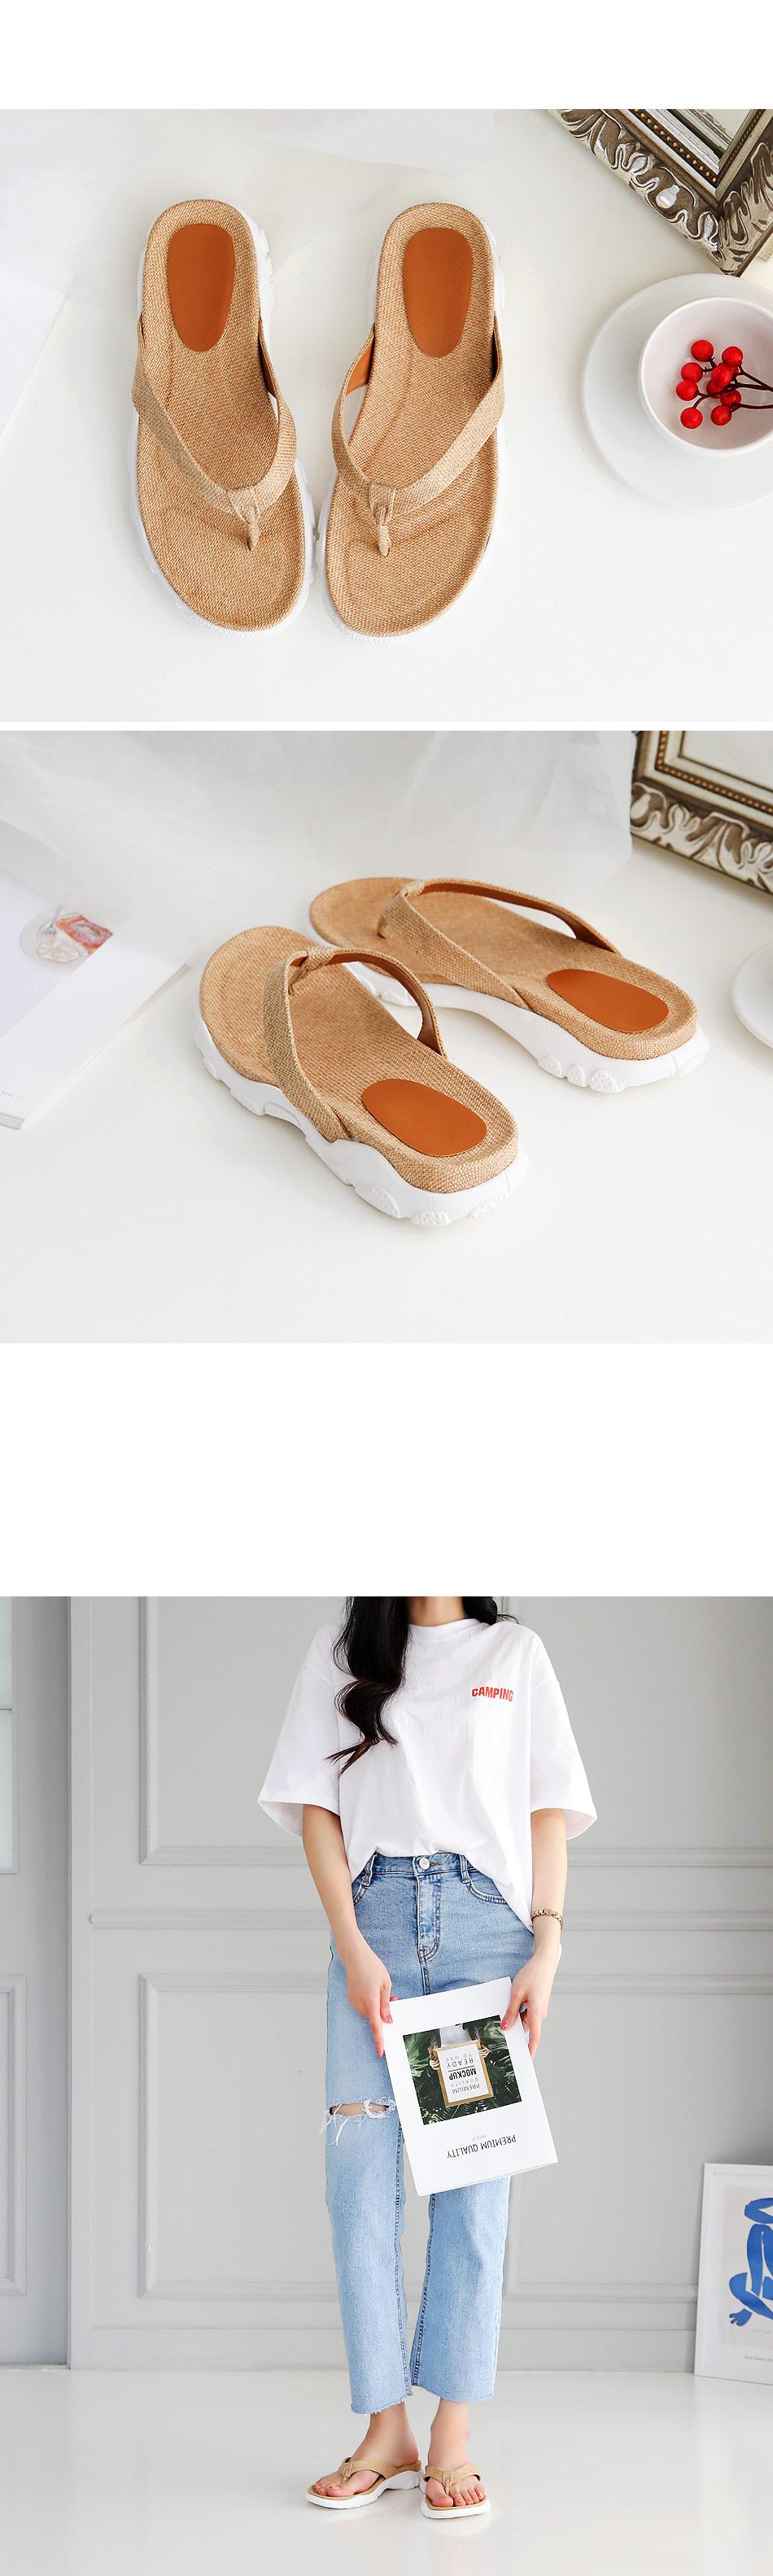 Tadiac Slippers 3cm